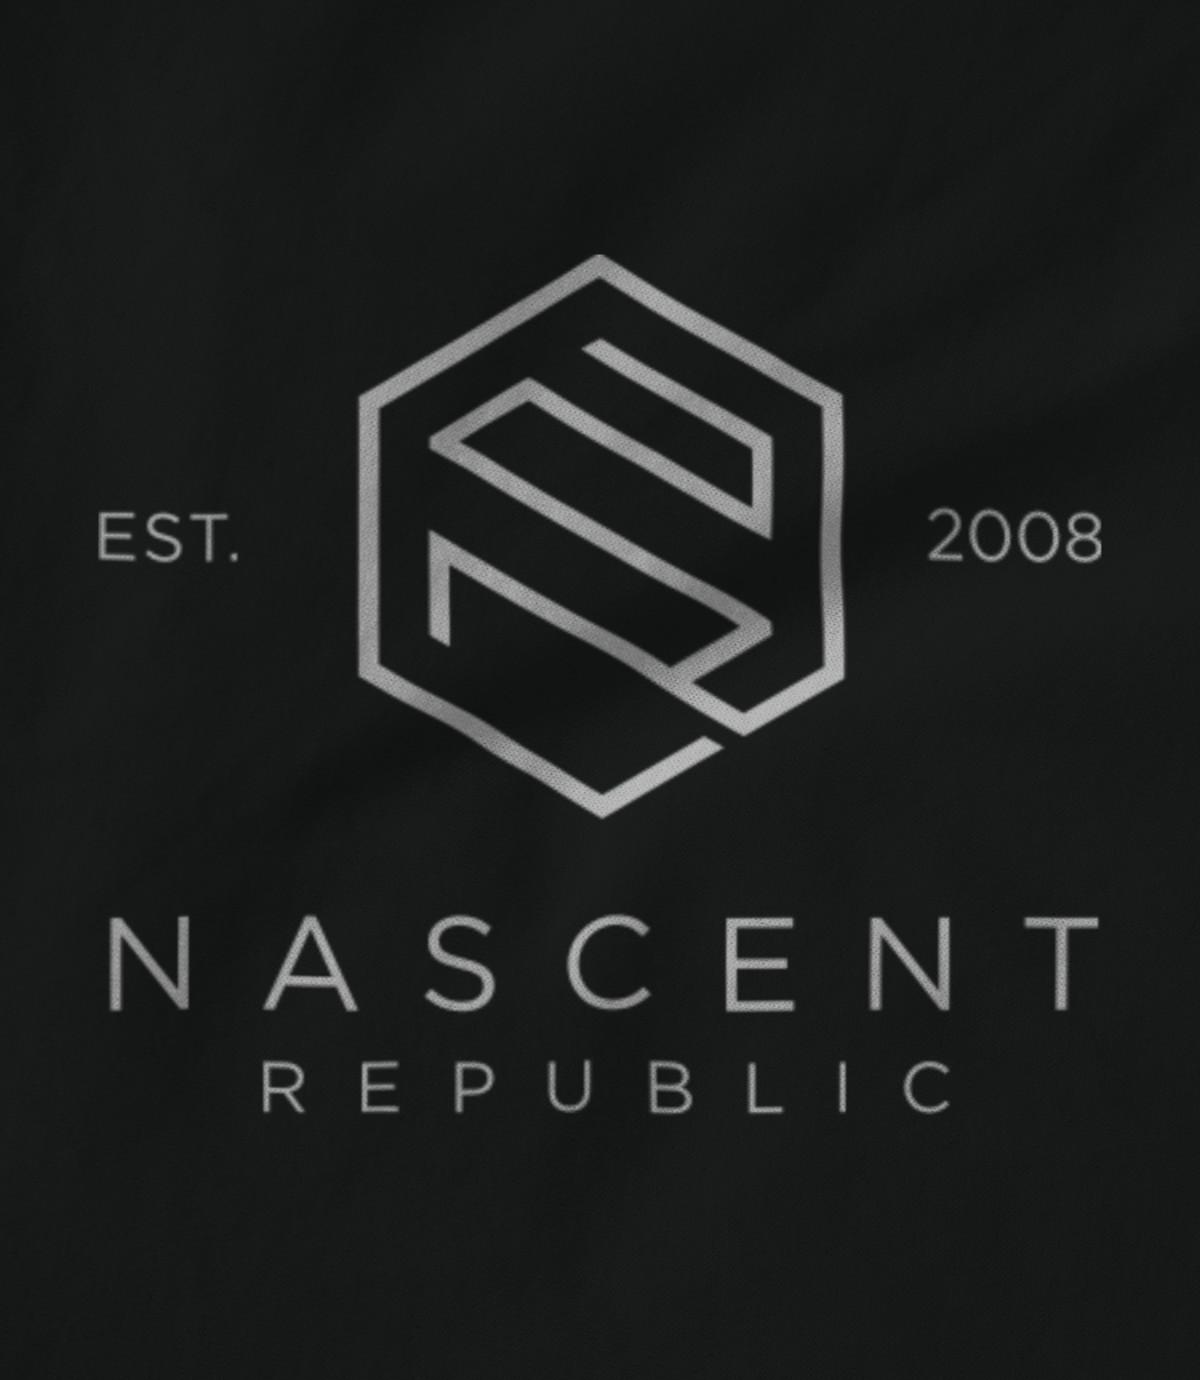 Nascent republic nr white black 1512516665